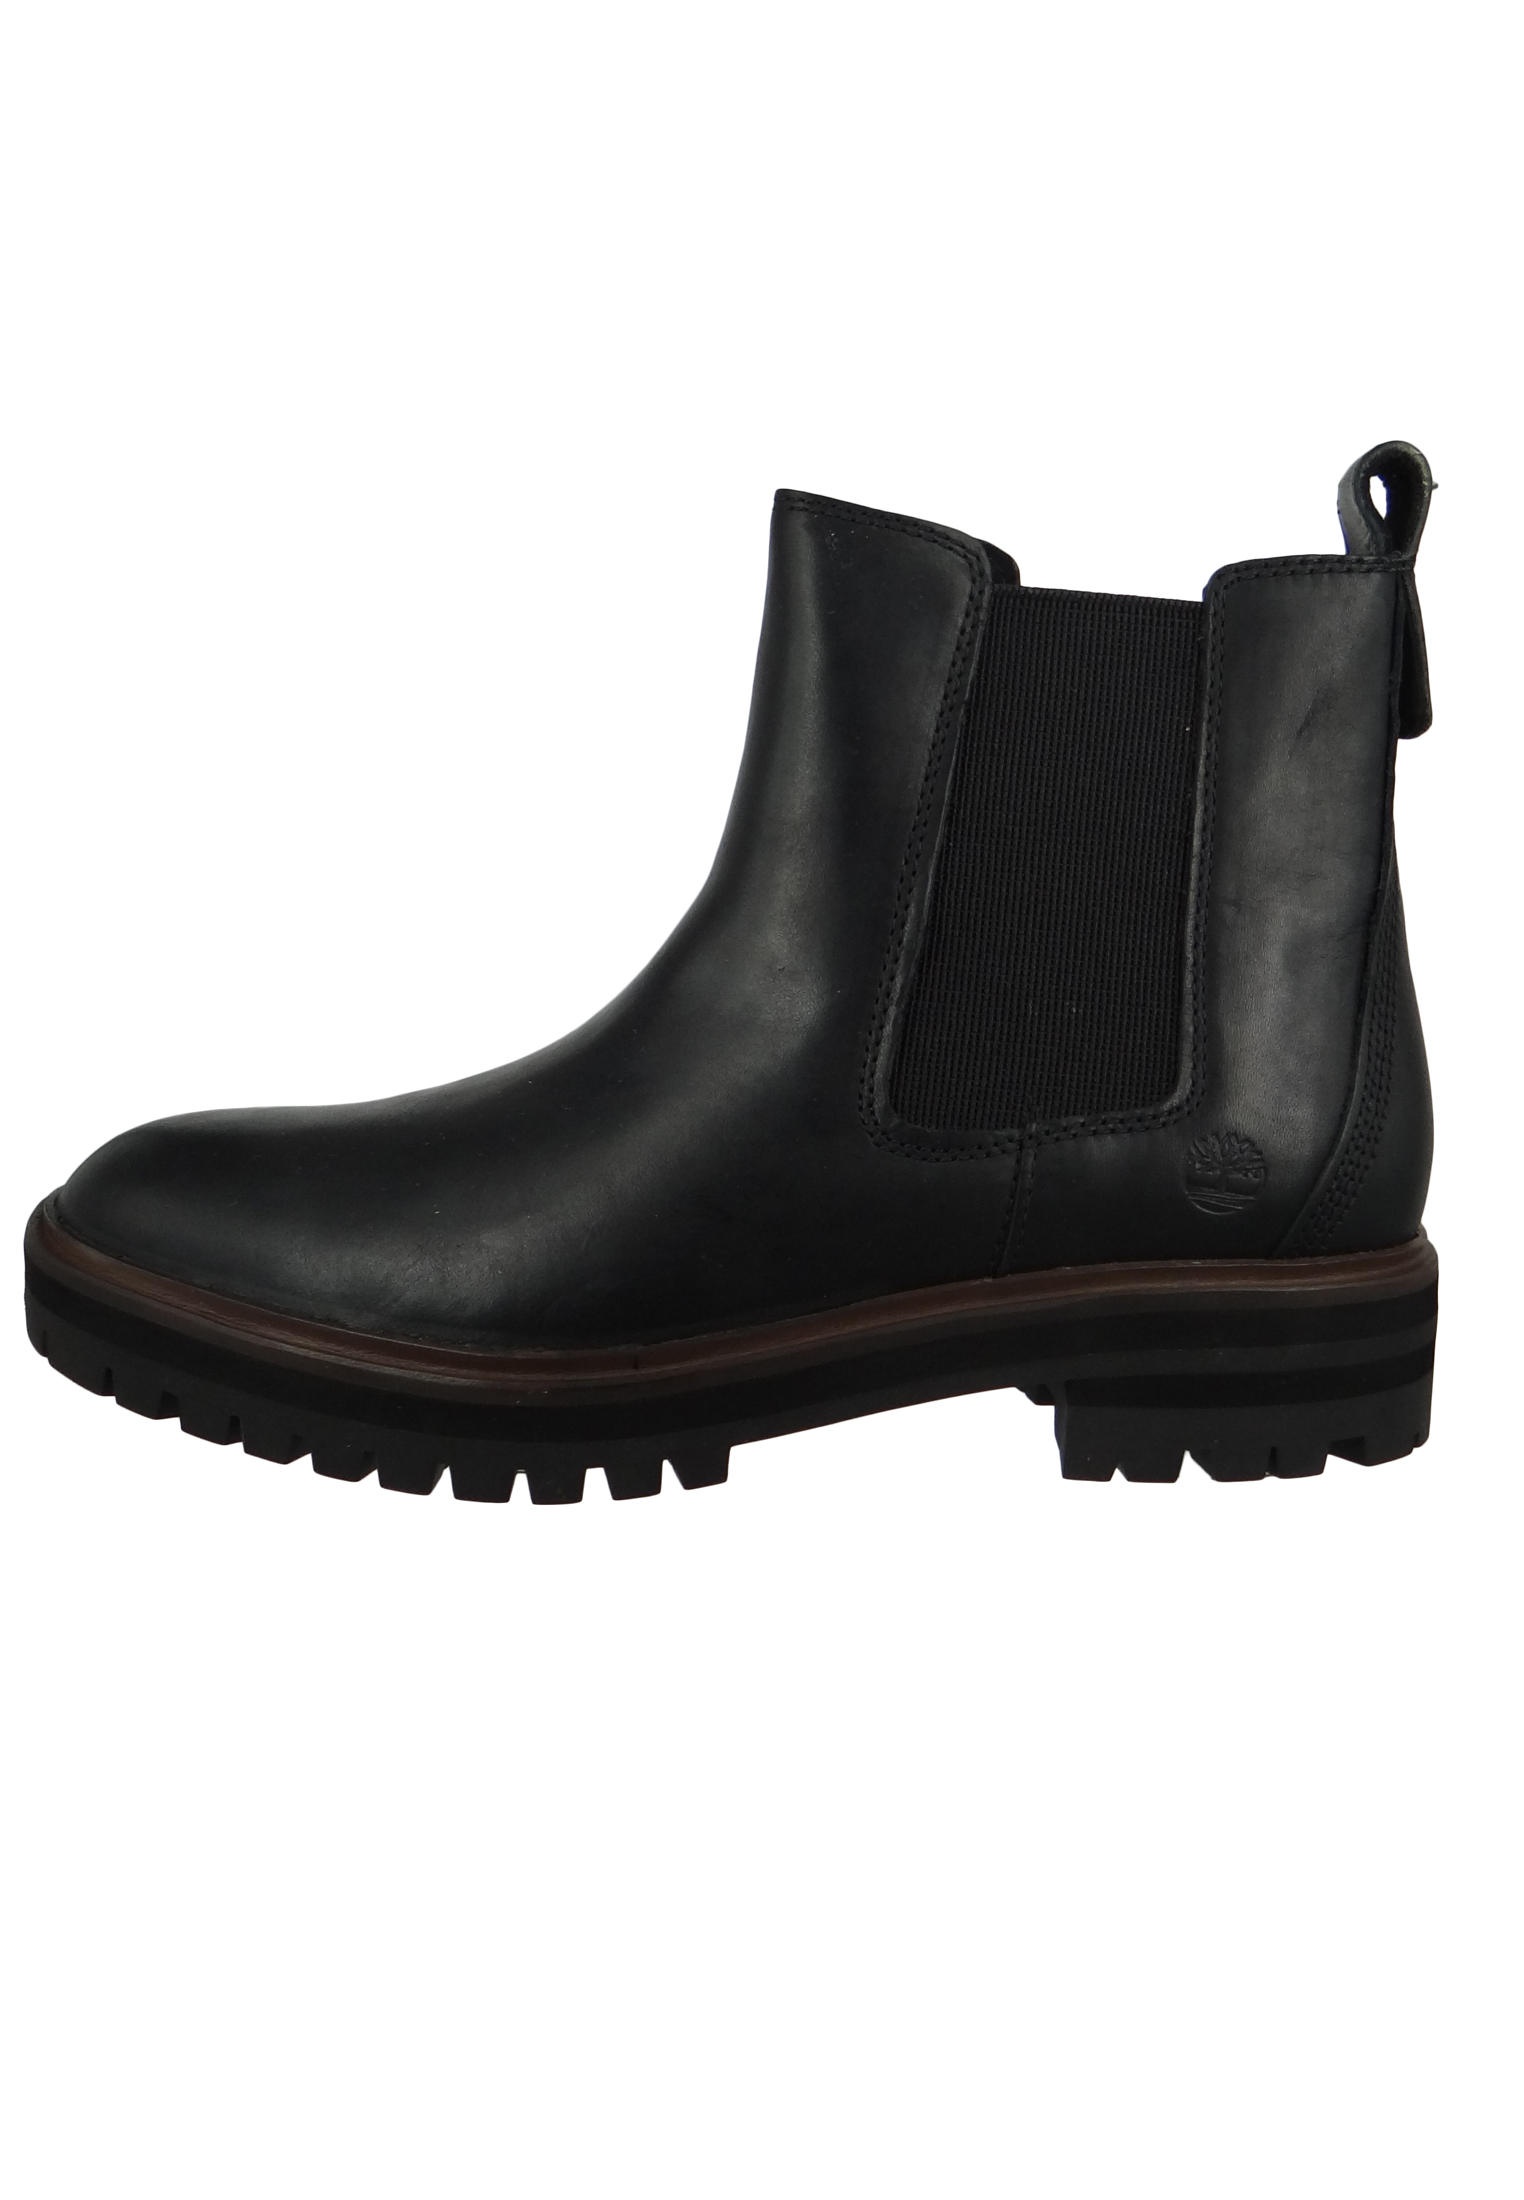 Timberland A1RBJ London Square Double Gore Chelsea Boot Damen Leder Stiefelette Black Full Grain Schwarz